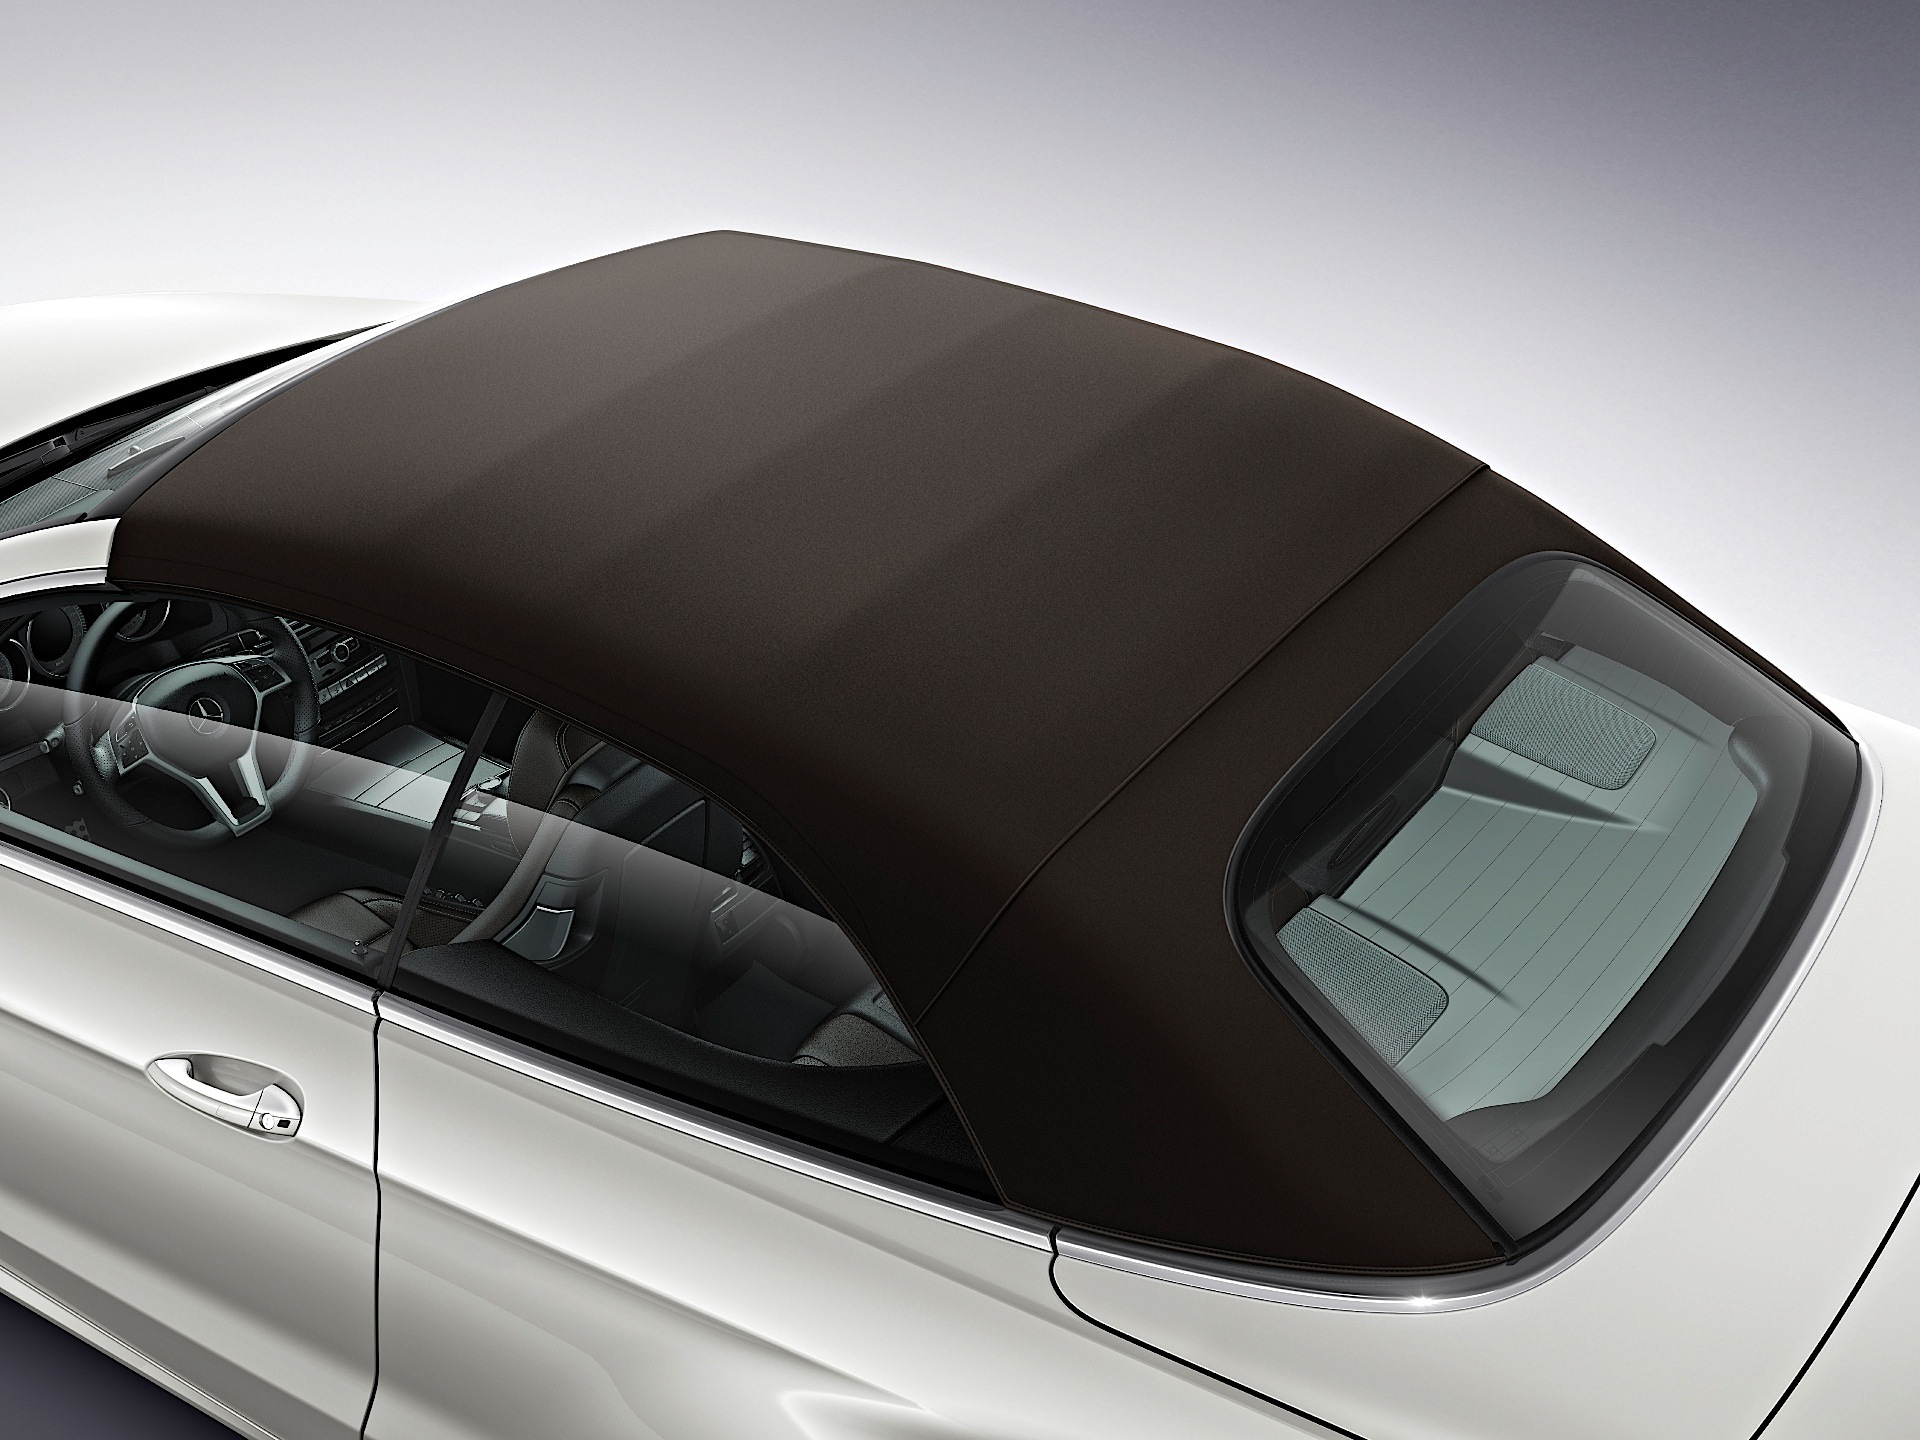 mercedes benz e klasse cabriolet a207 2013 2014 2015 2016 2017 autoevolution. Black Bedroom Furniture Sets. Home Design Ideas